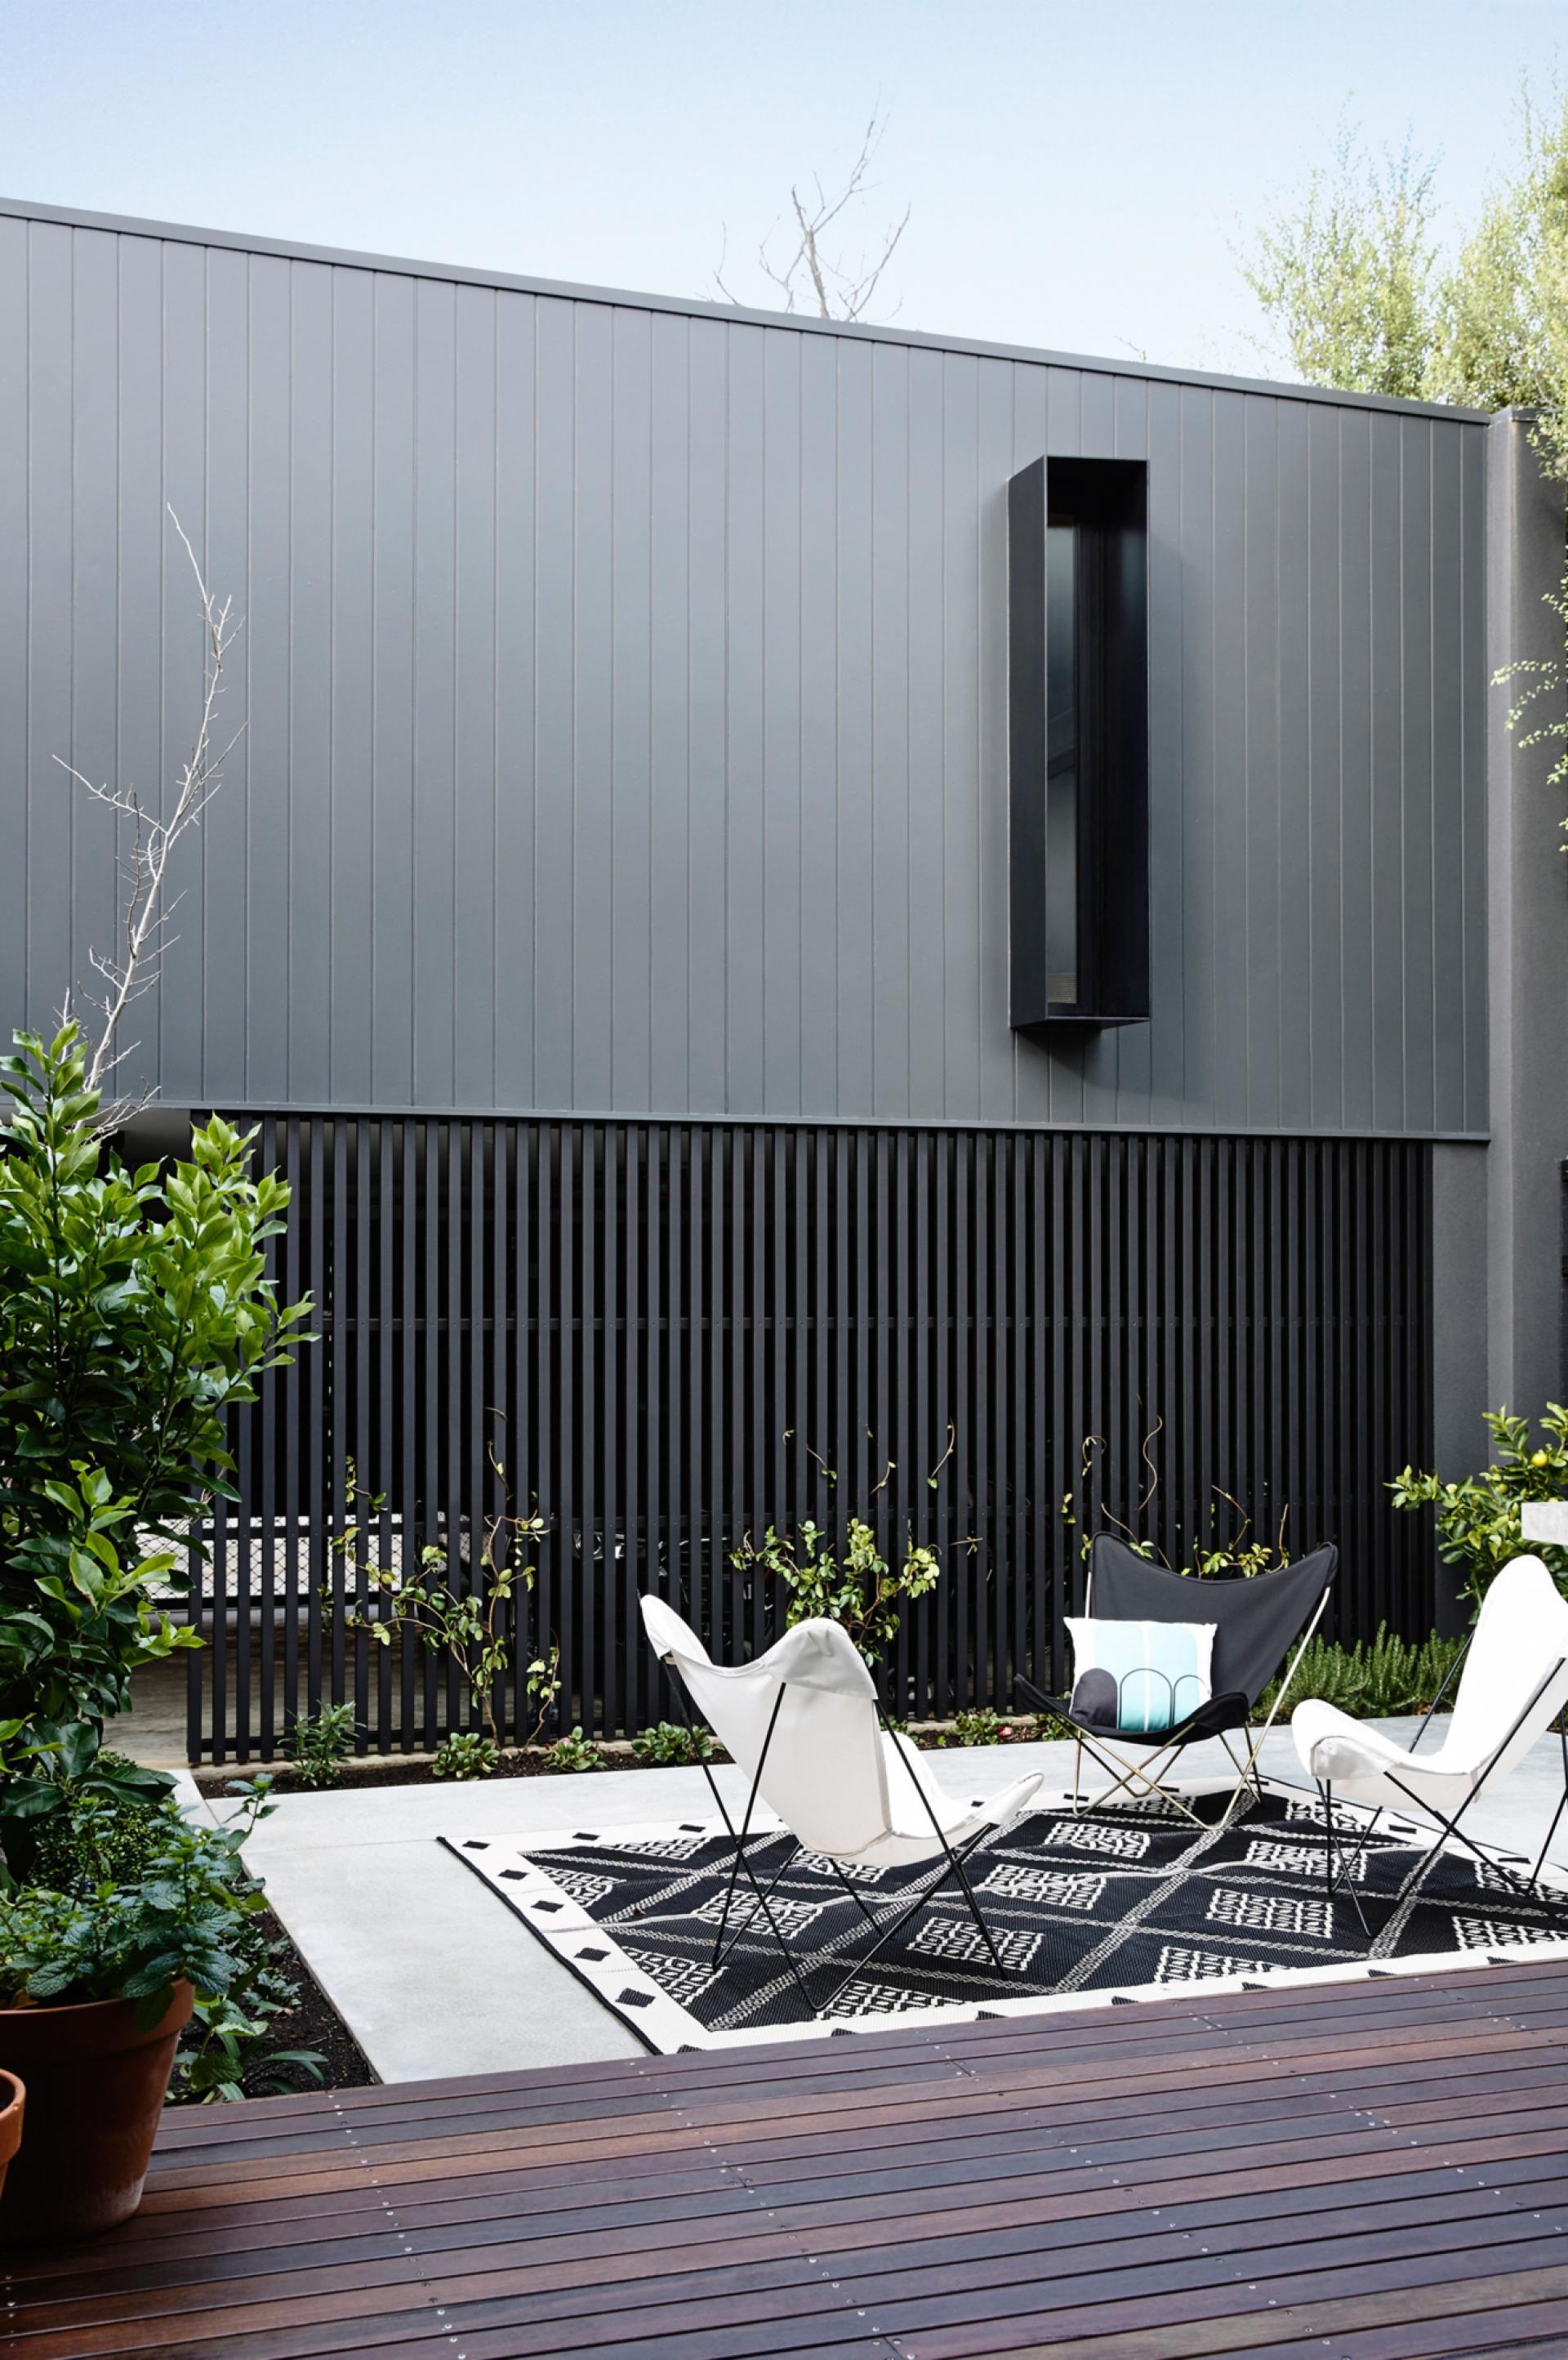 Townhouse Yoga Studio Inner City Oasis Photography By Derek Swalwell Designed Exterior